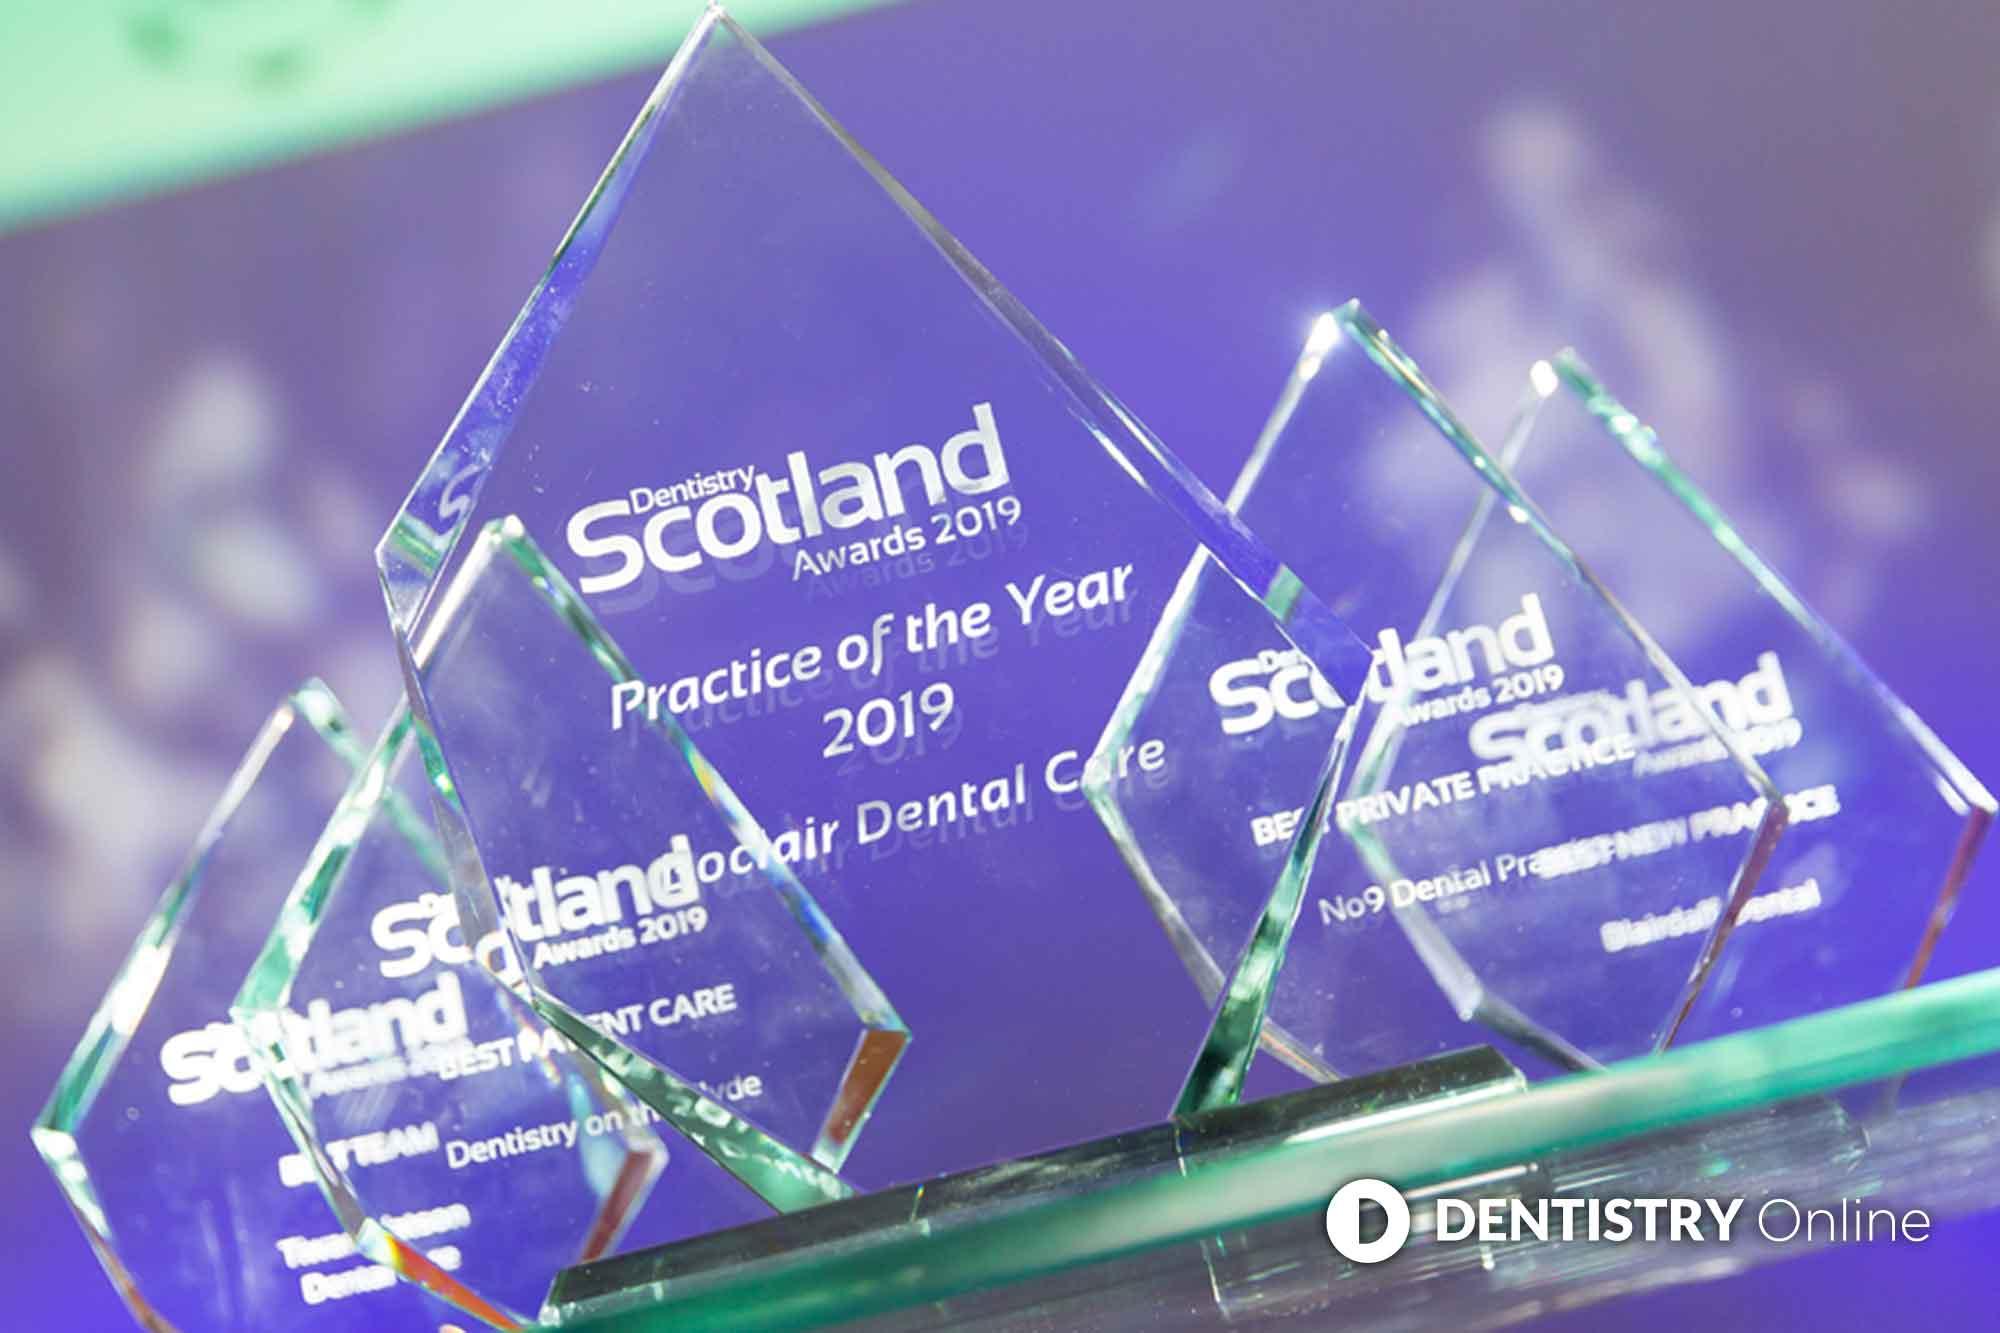 Dentistry Scotland Awards